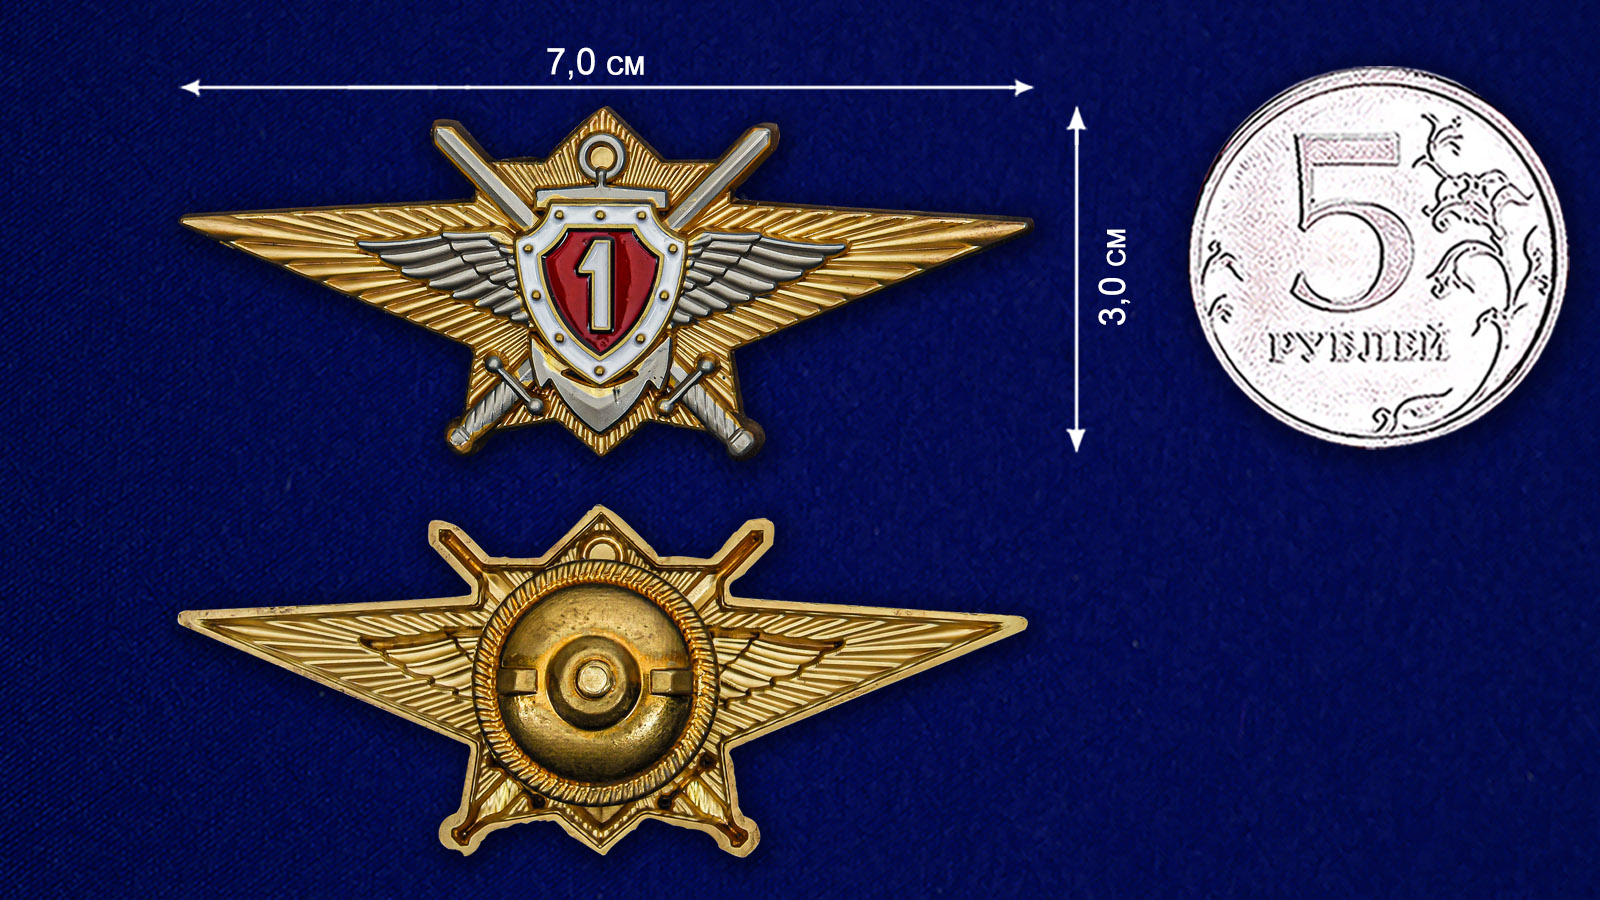 Знак Росгвардии Классная квалификация (специалист 1-го класса) - размер